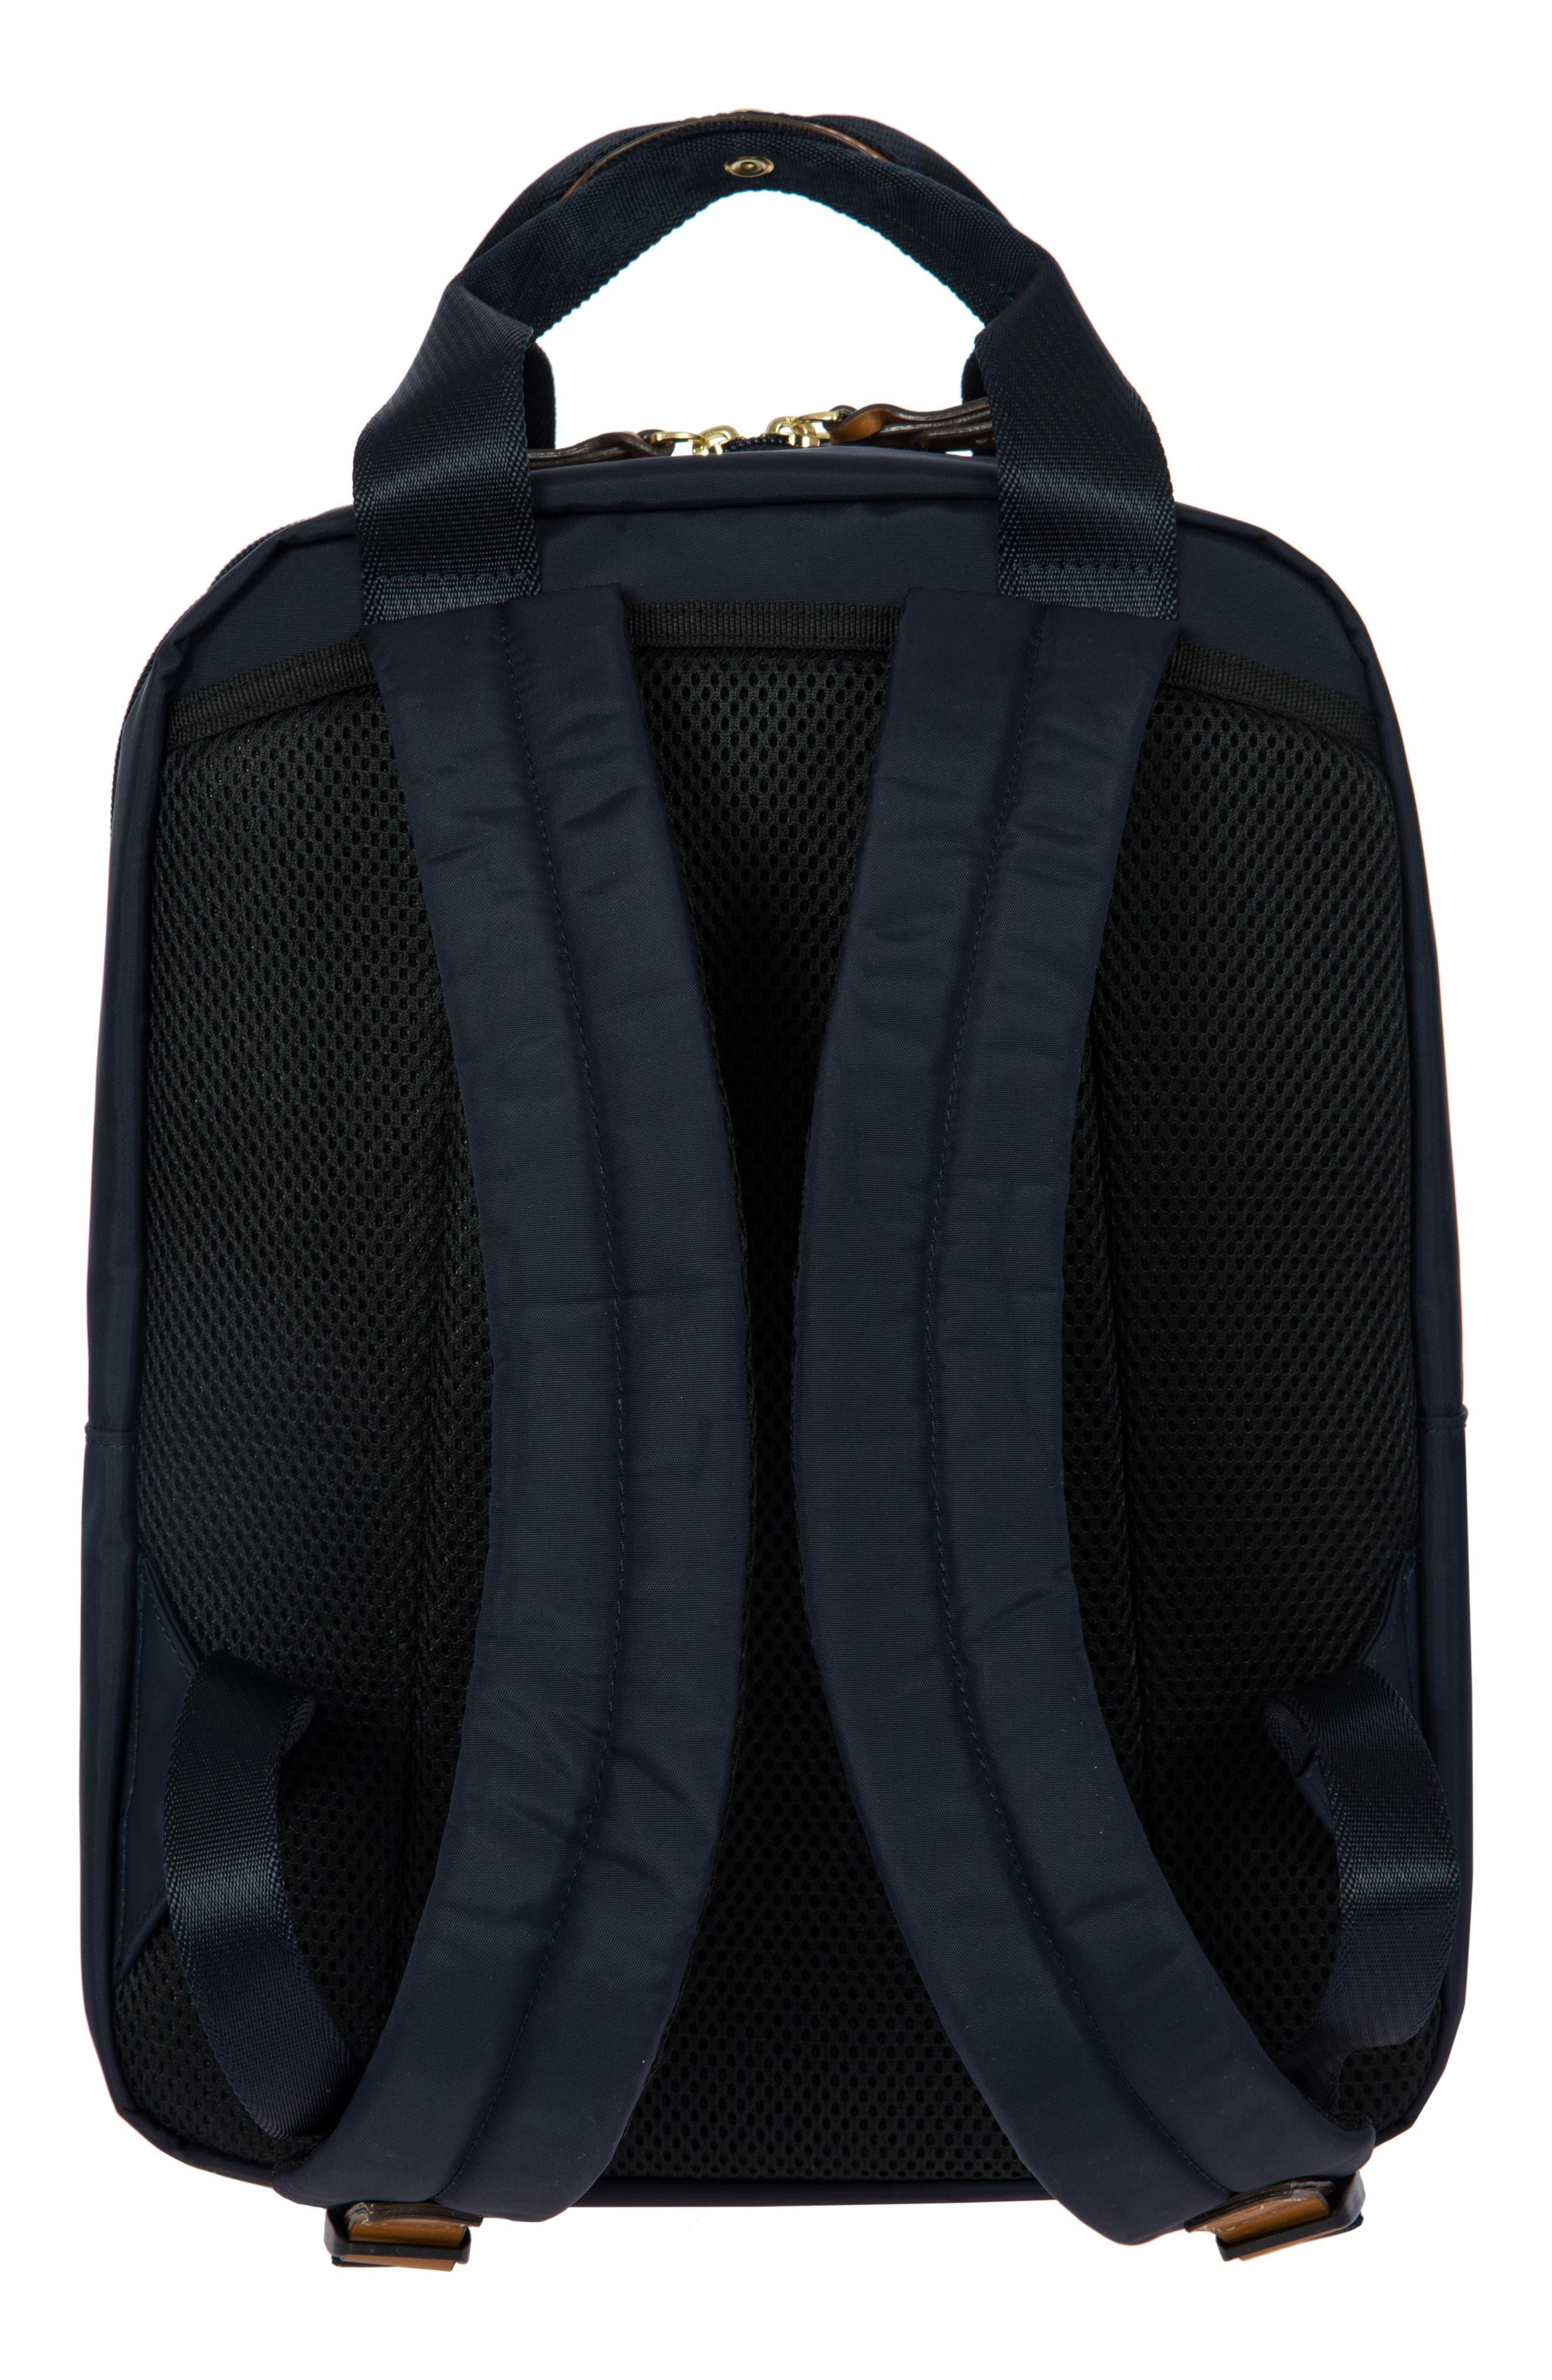 X-Bag Travel Urban Backpack,                             Alternate thumbnail 2, color,                             Navy